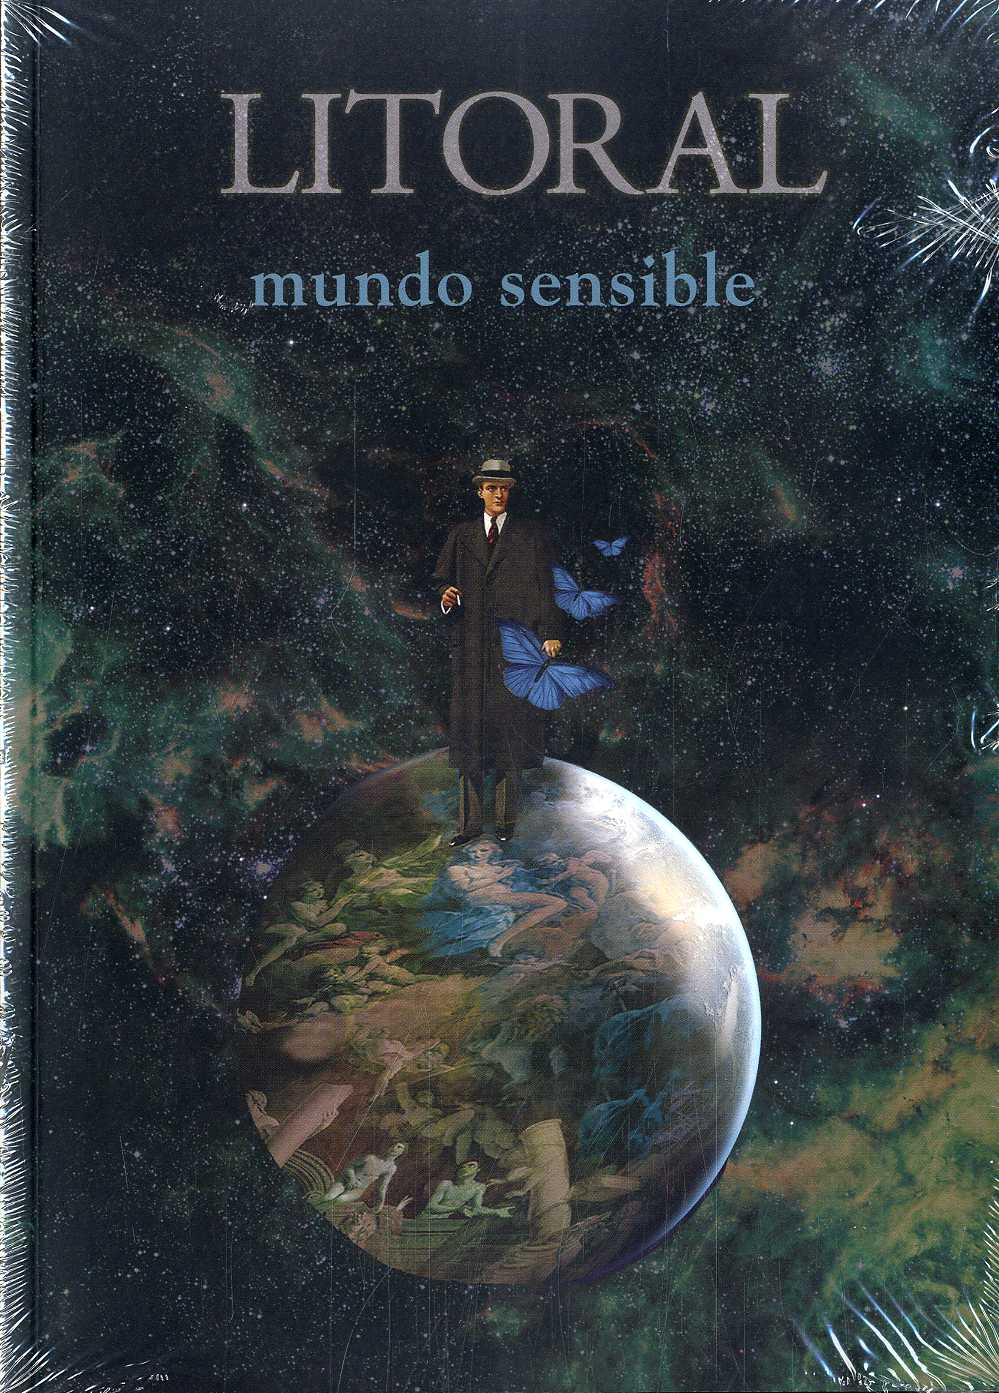 MUNDO SENSIBLE LITORAL - 270